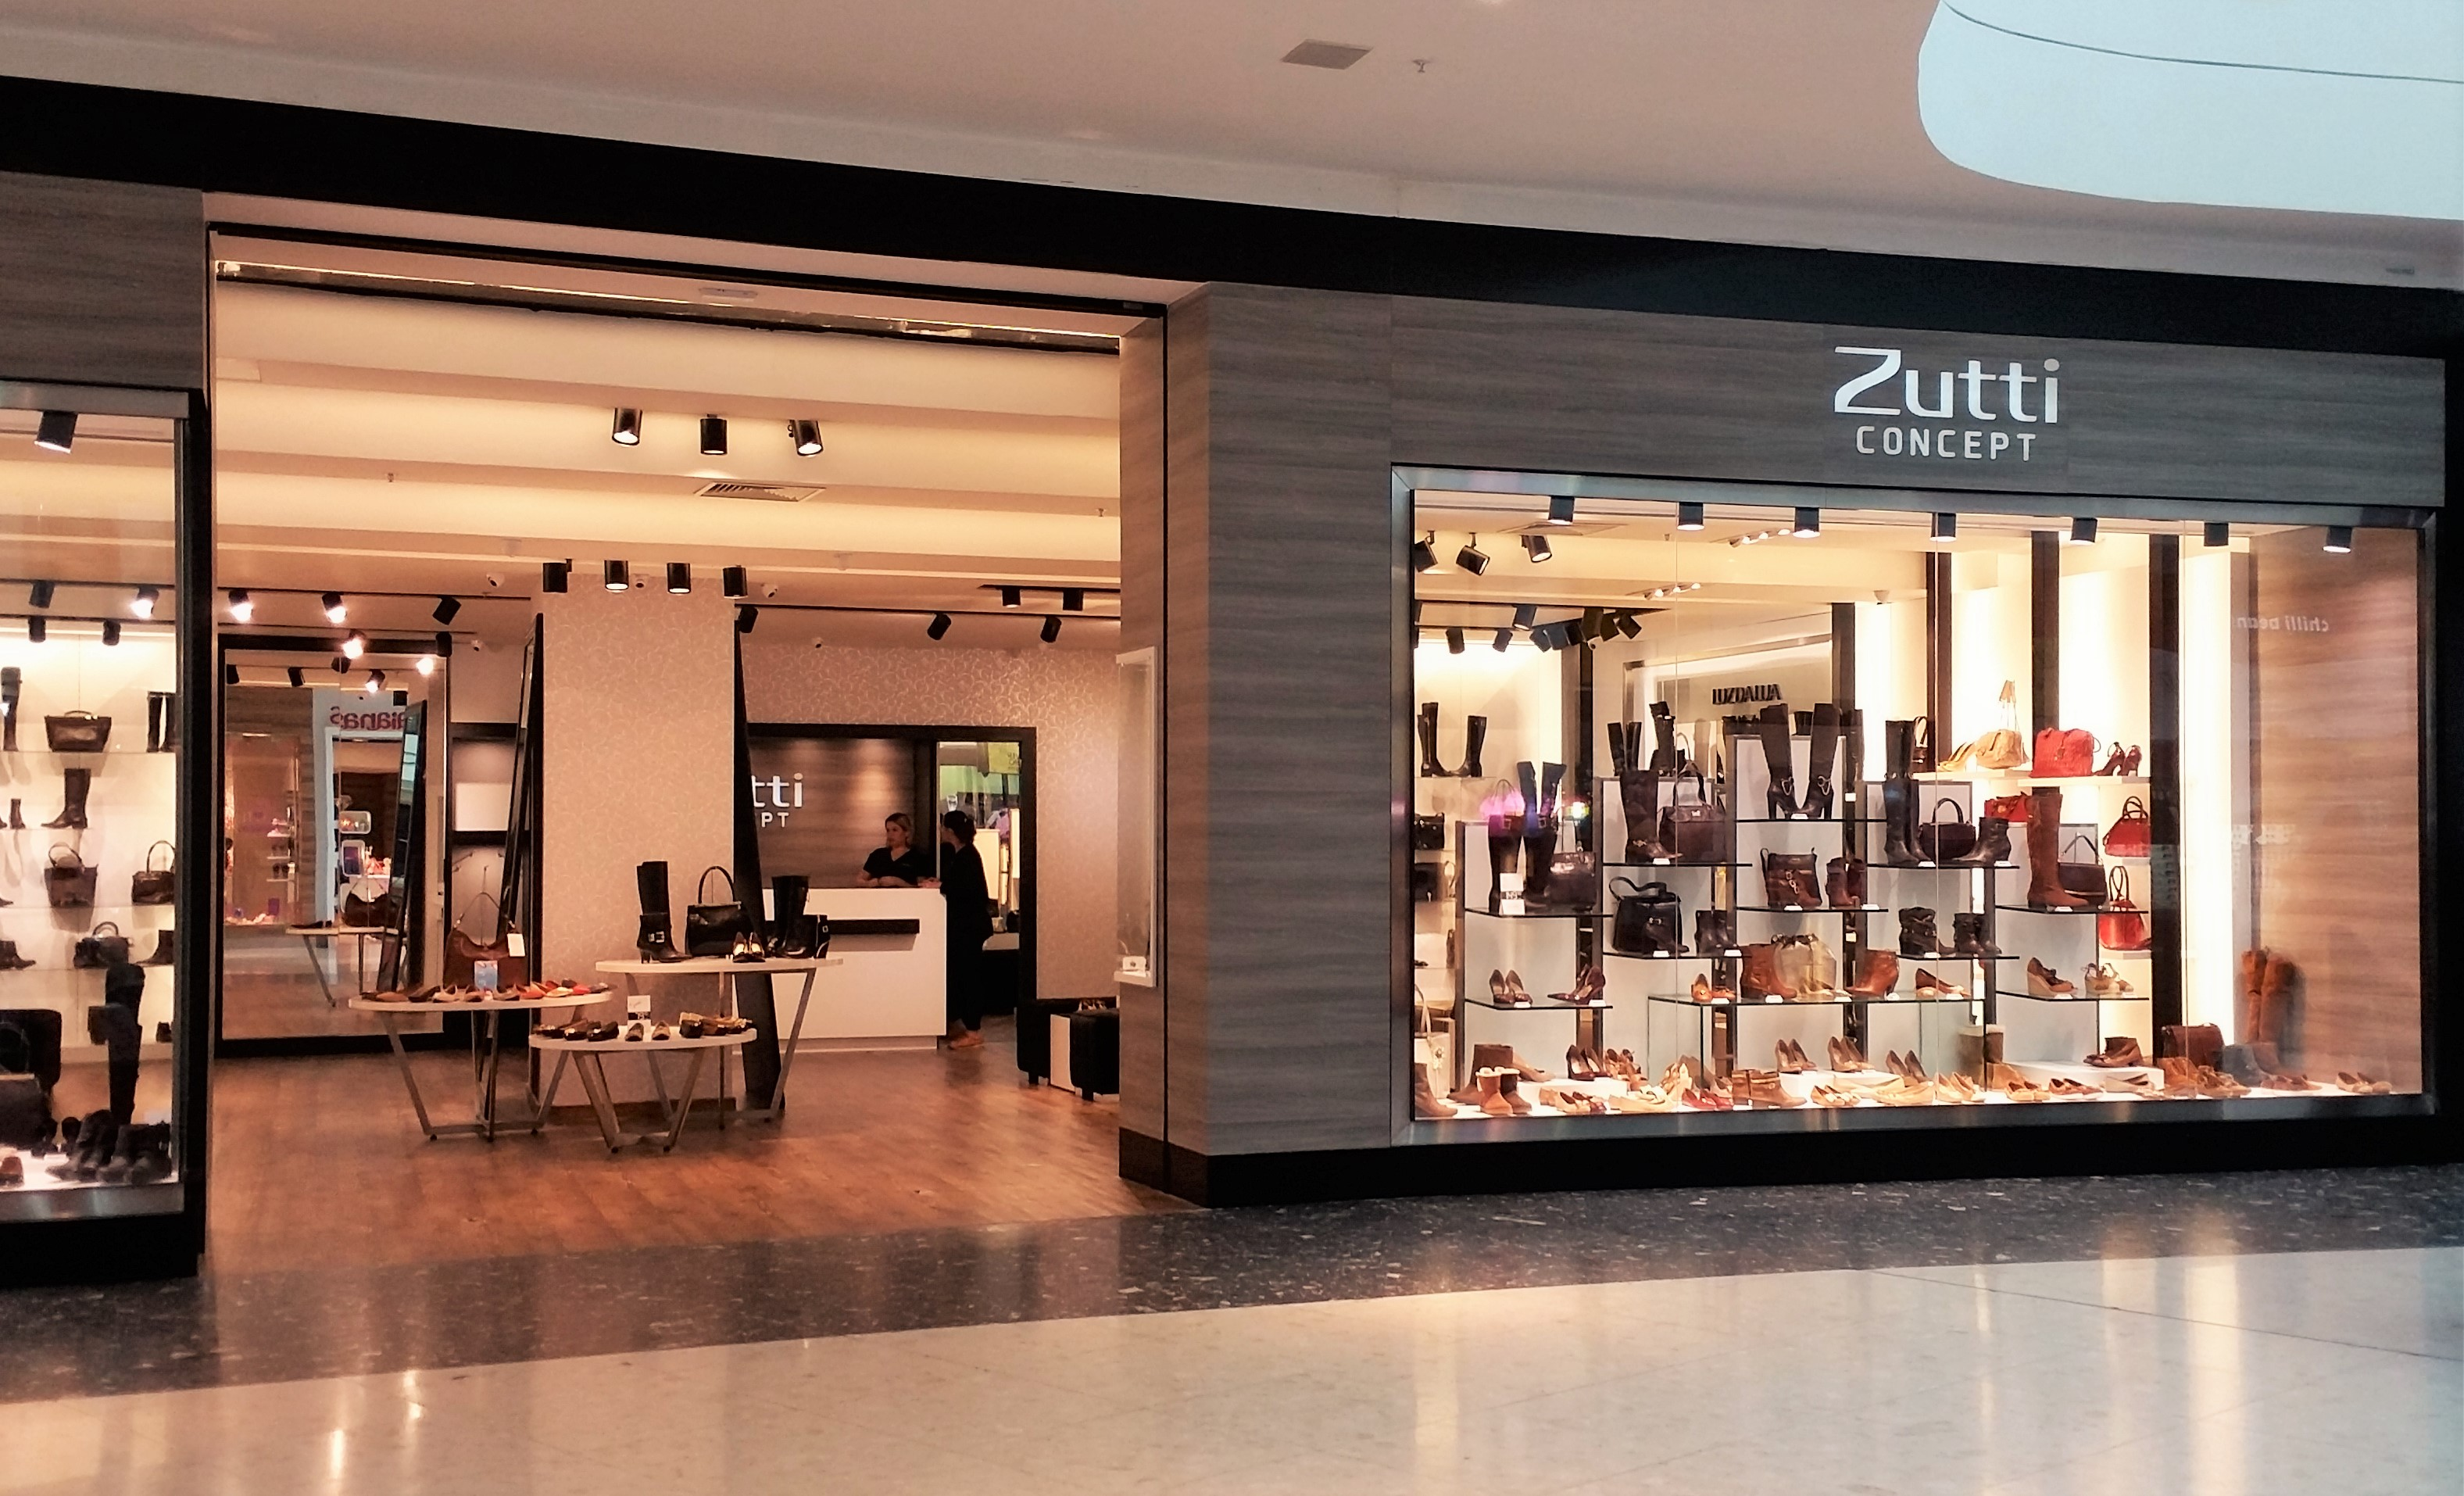 Zutti Concept